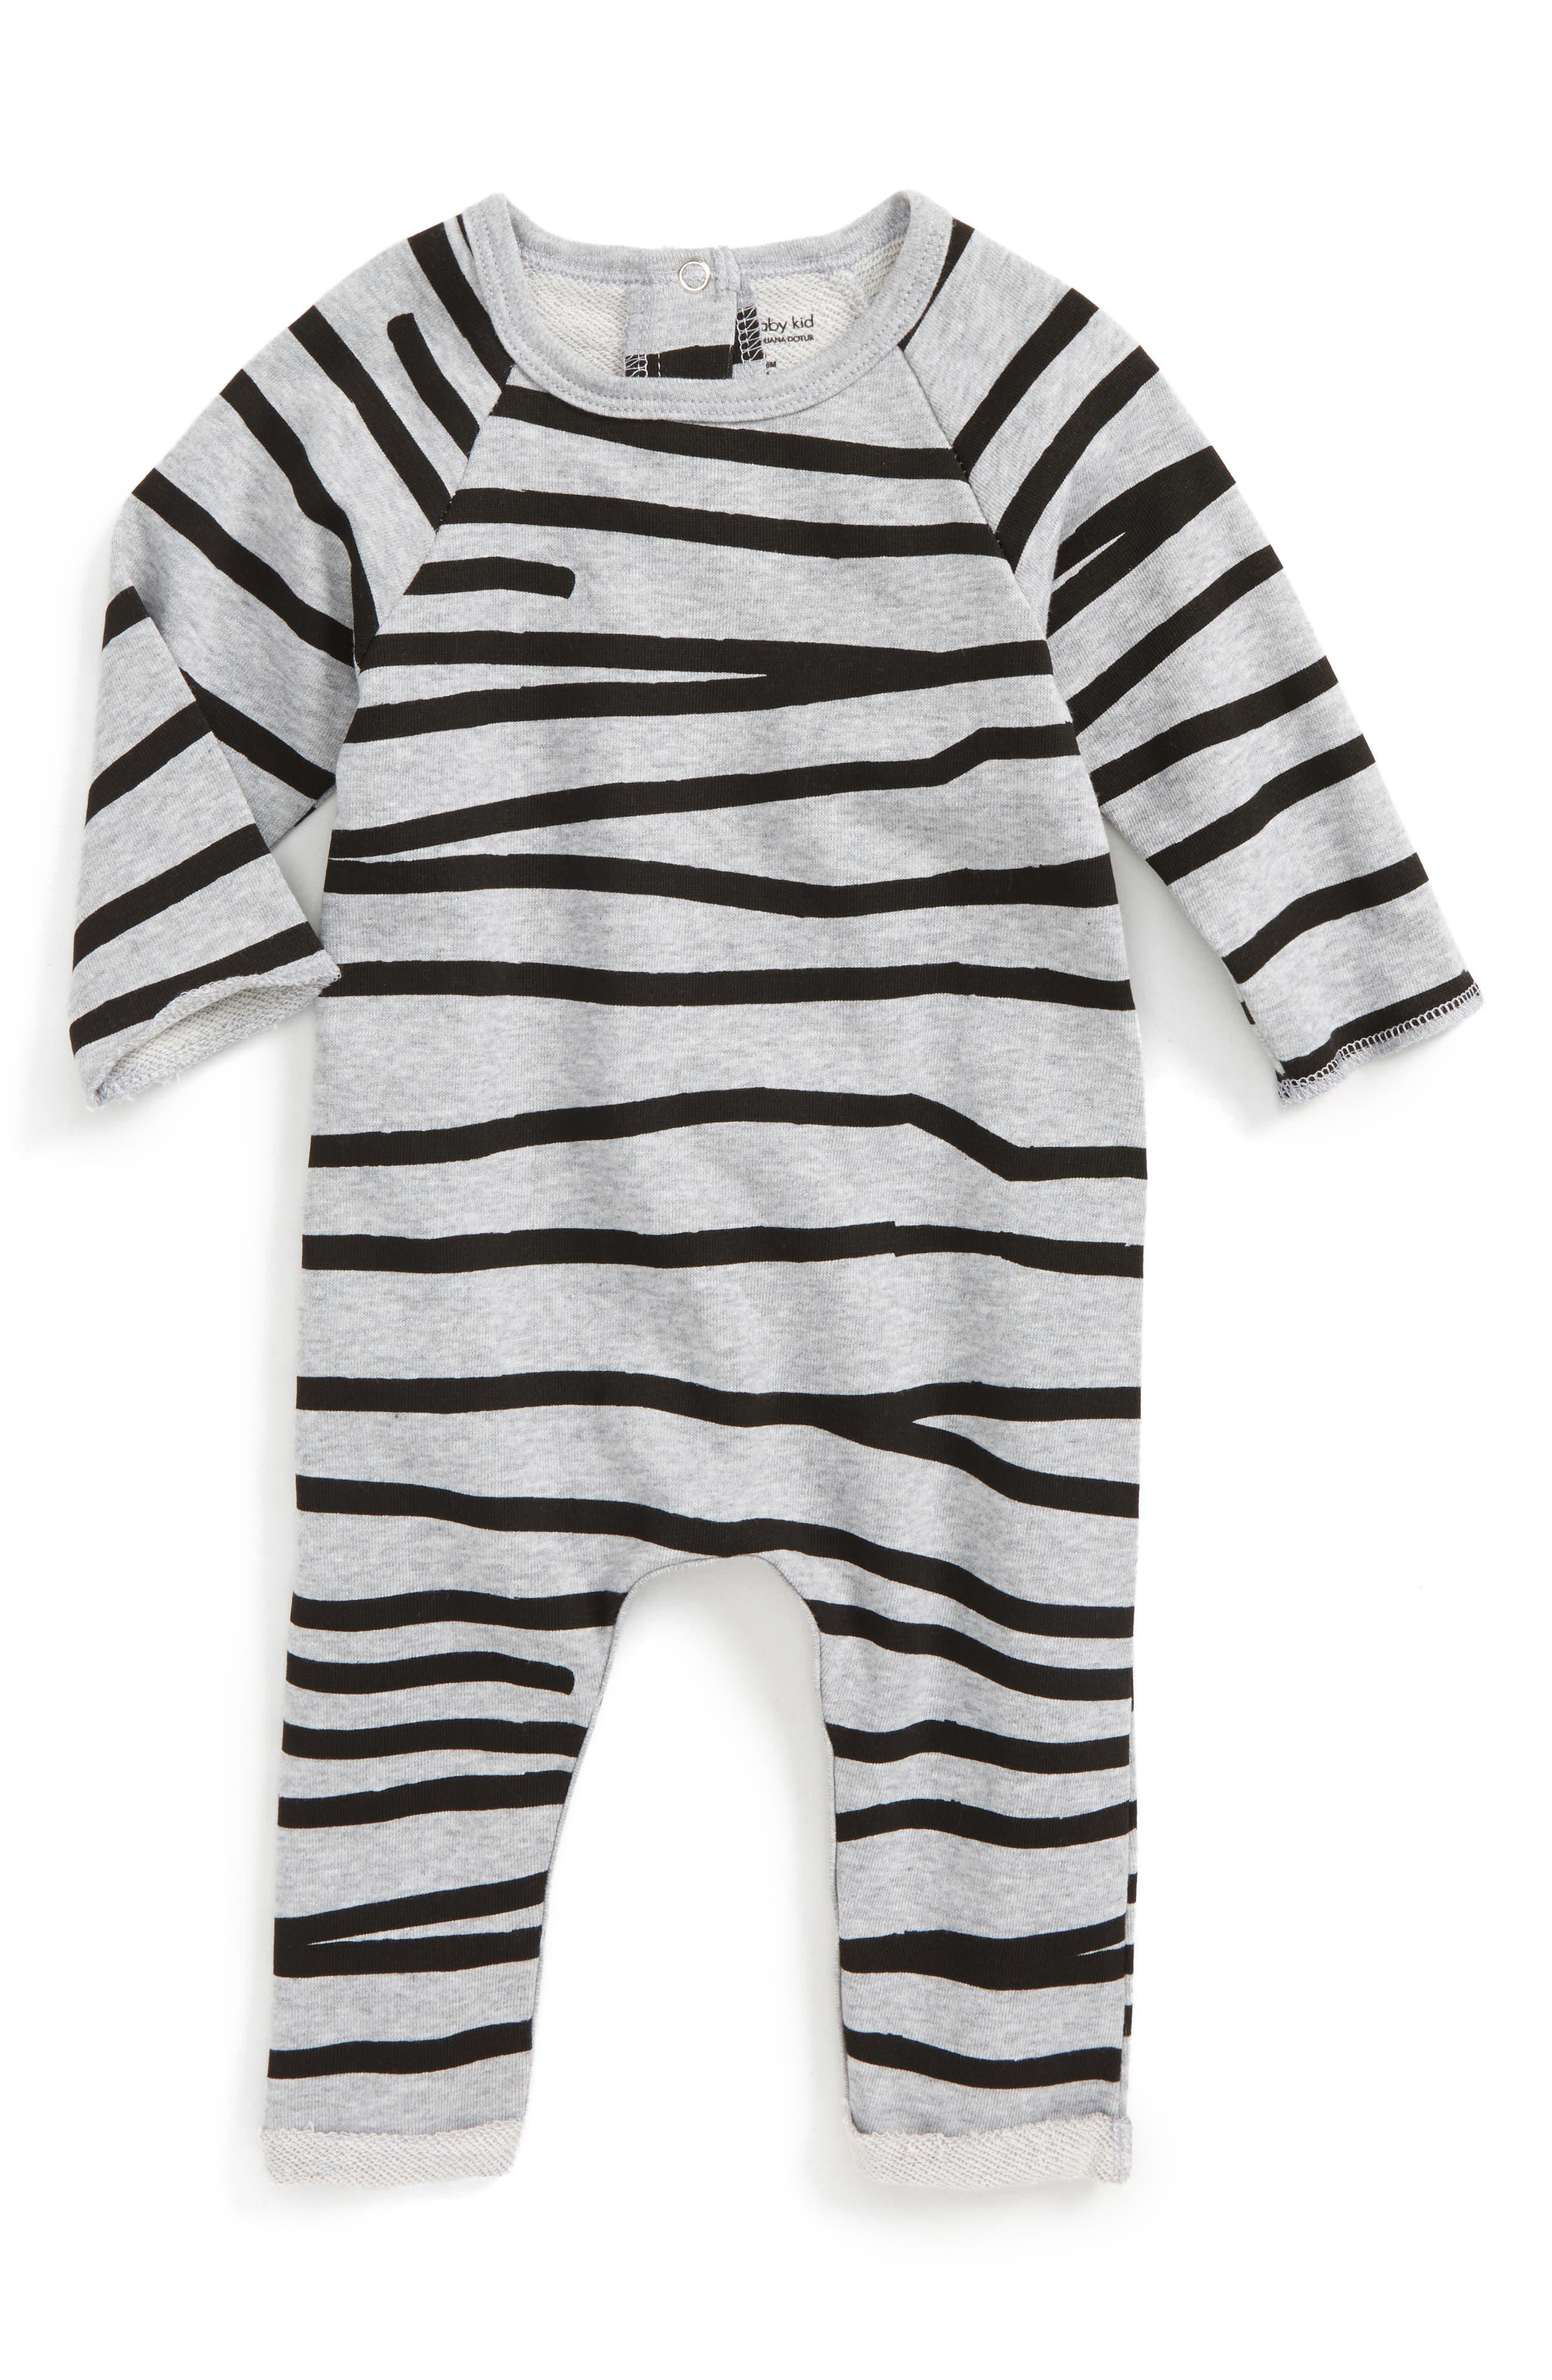 Stripe Romper,                         Main,                         color, Grey Marle/ Black